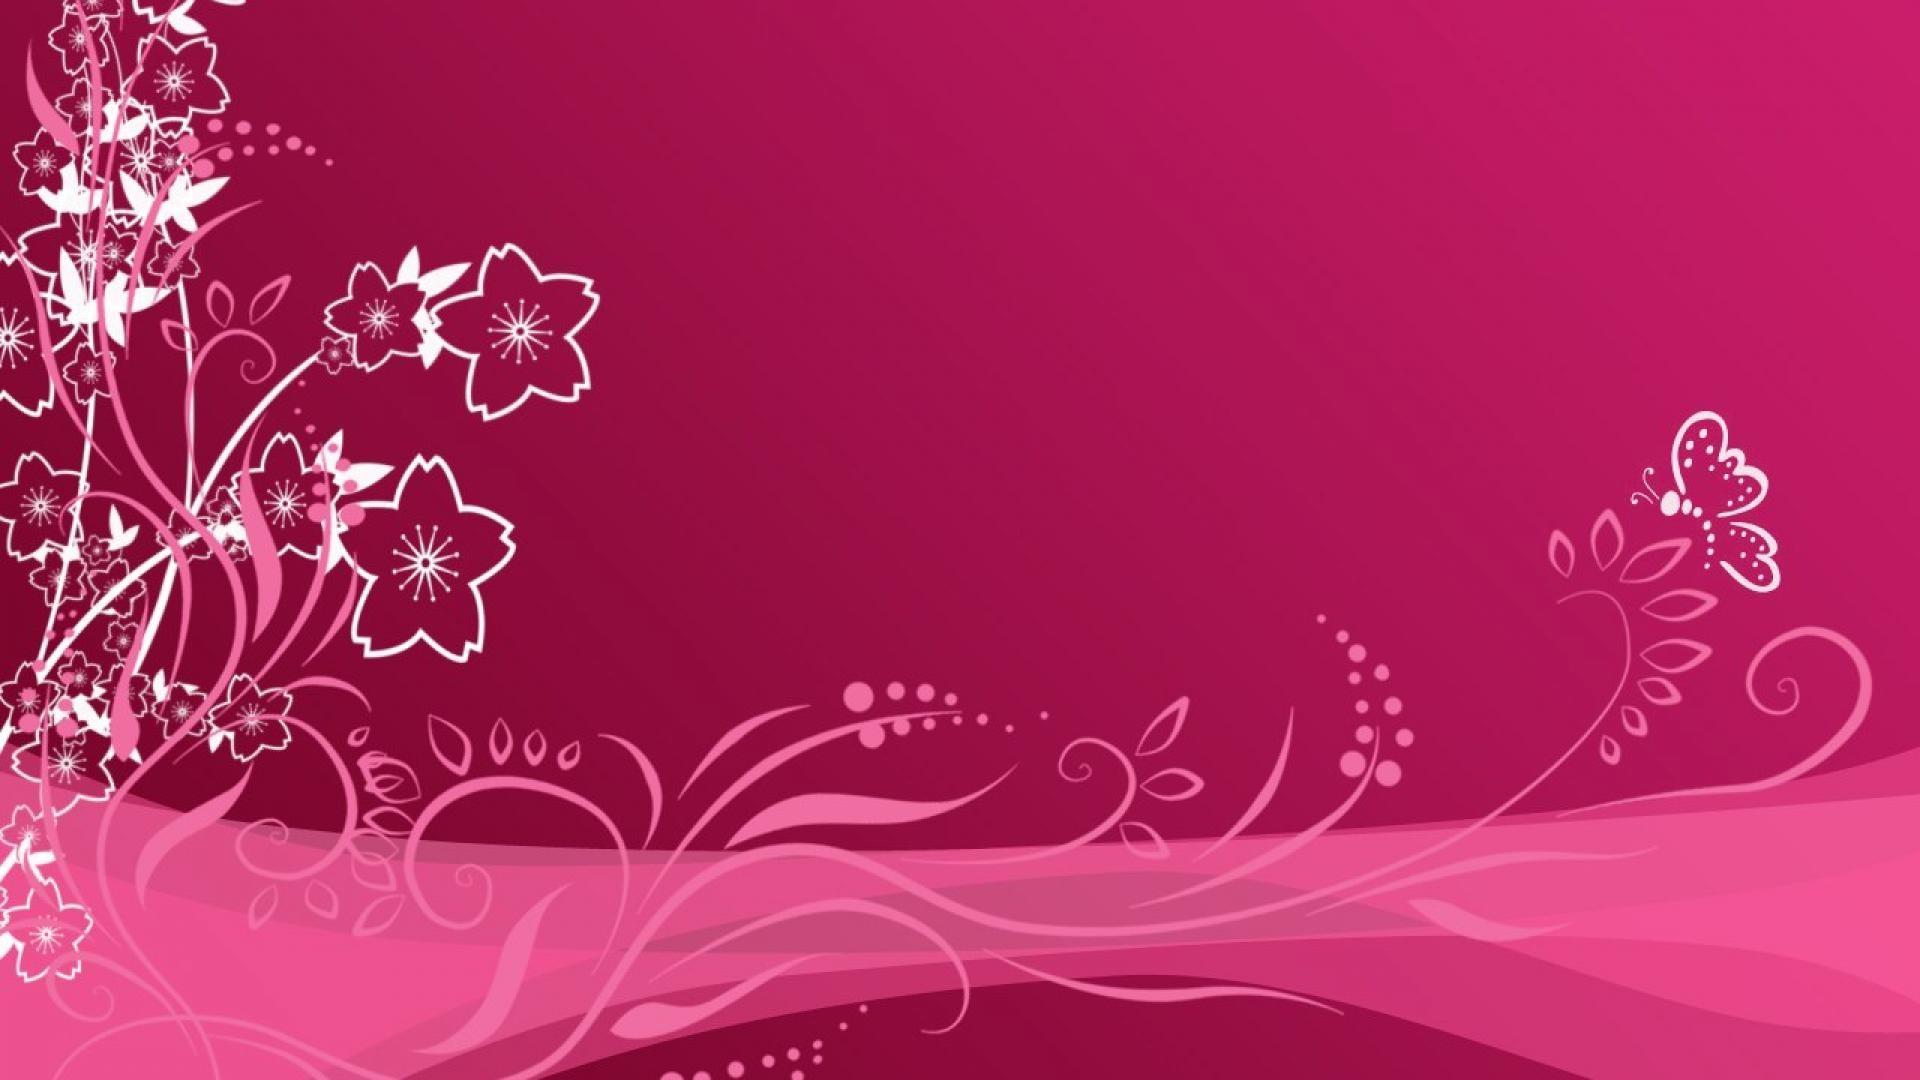 2560x1600 Light Pink Wallpapers - Full HD wallpaper search